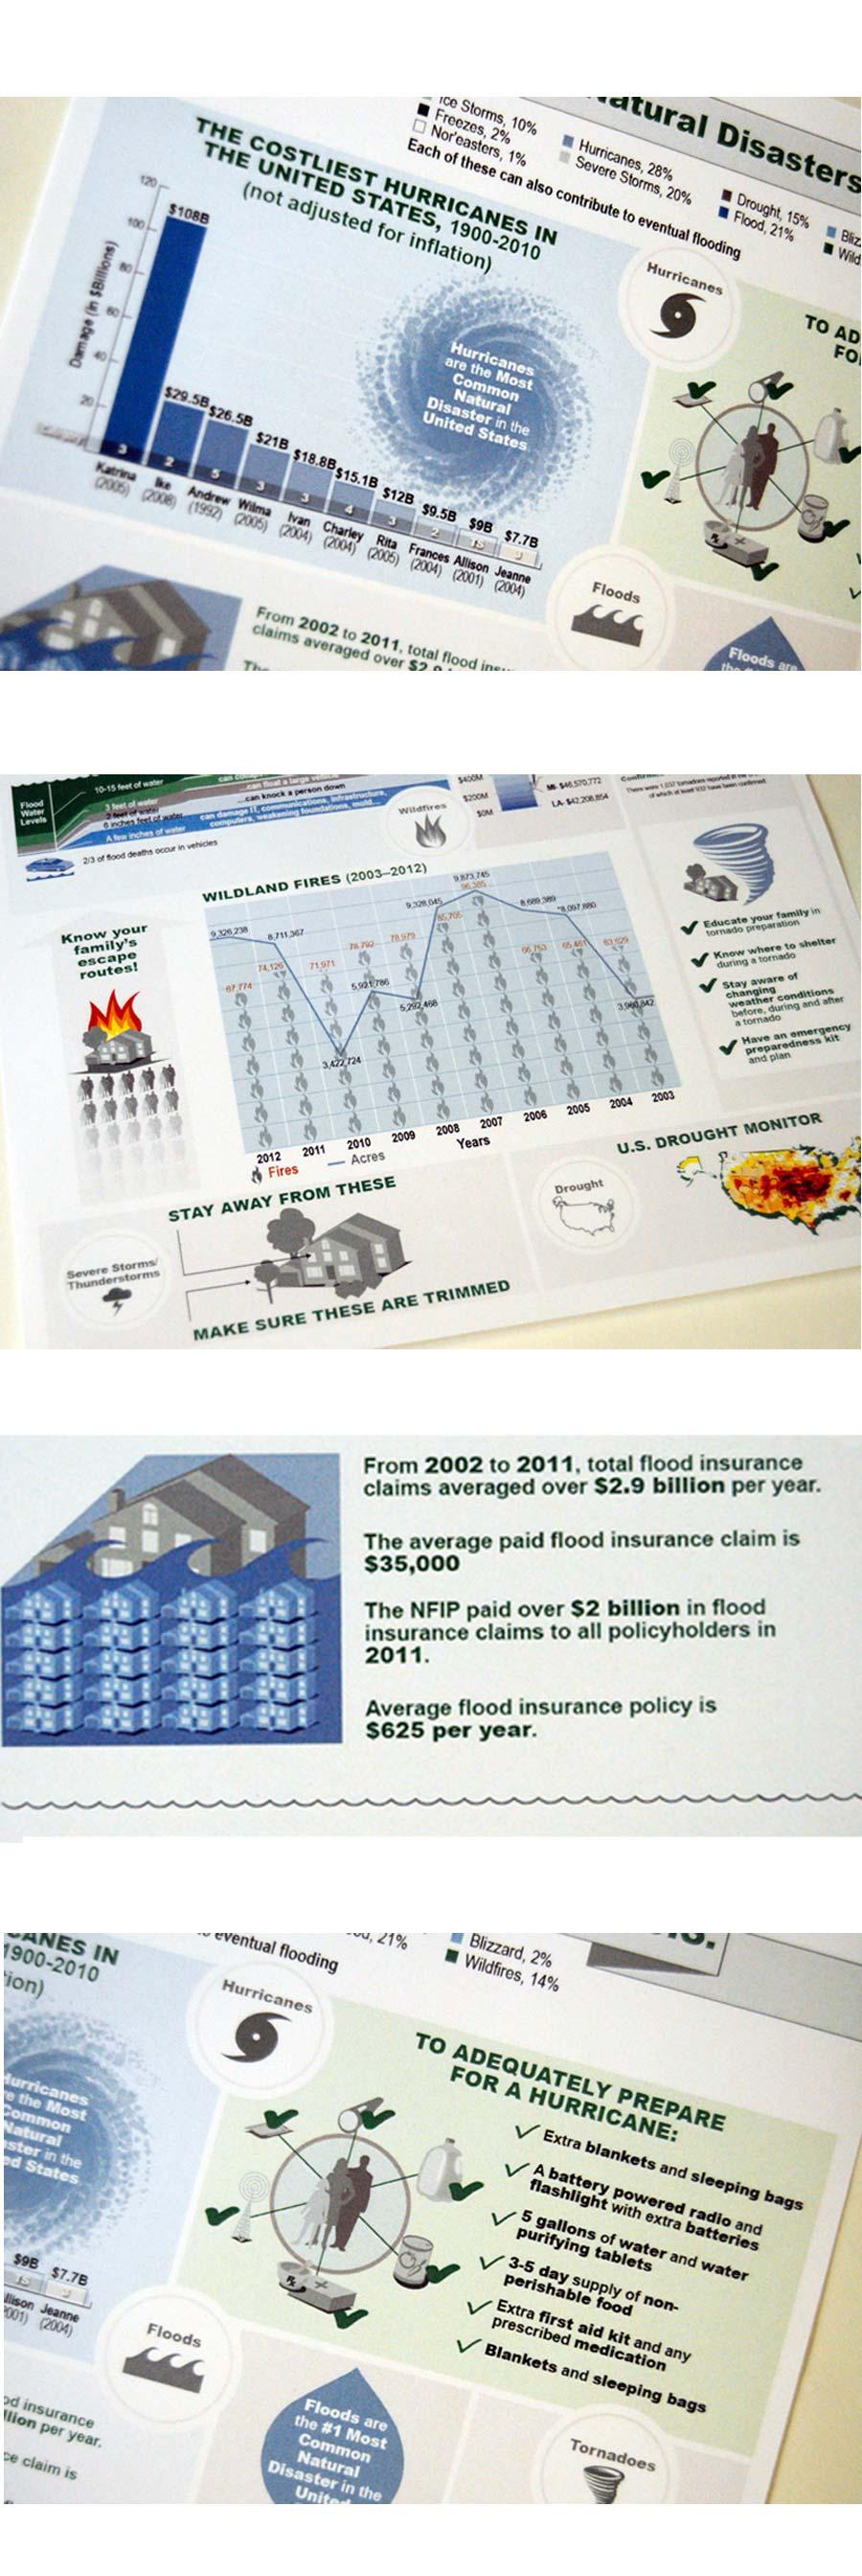 FEMA Information